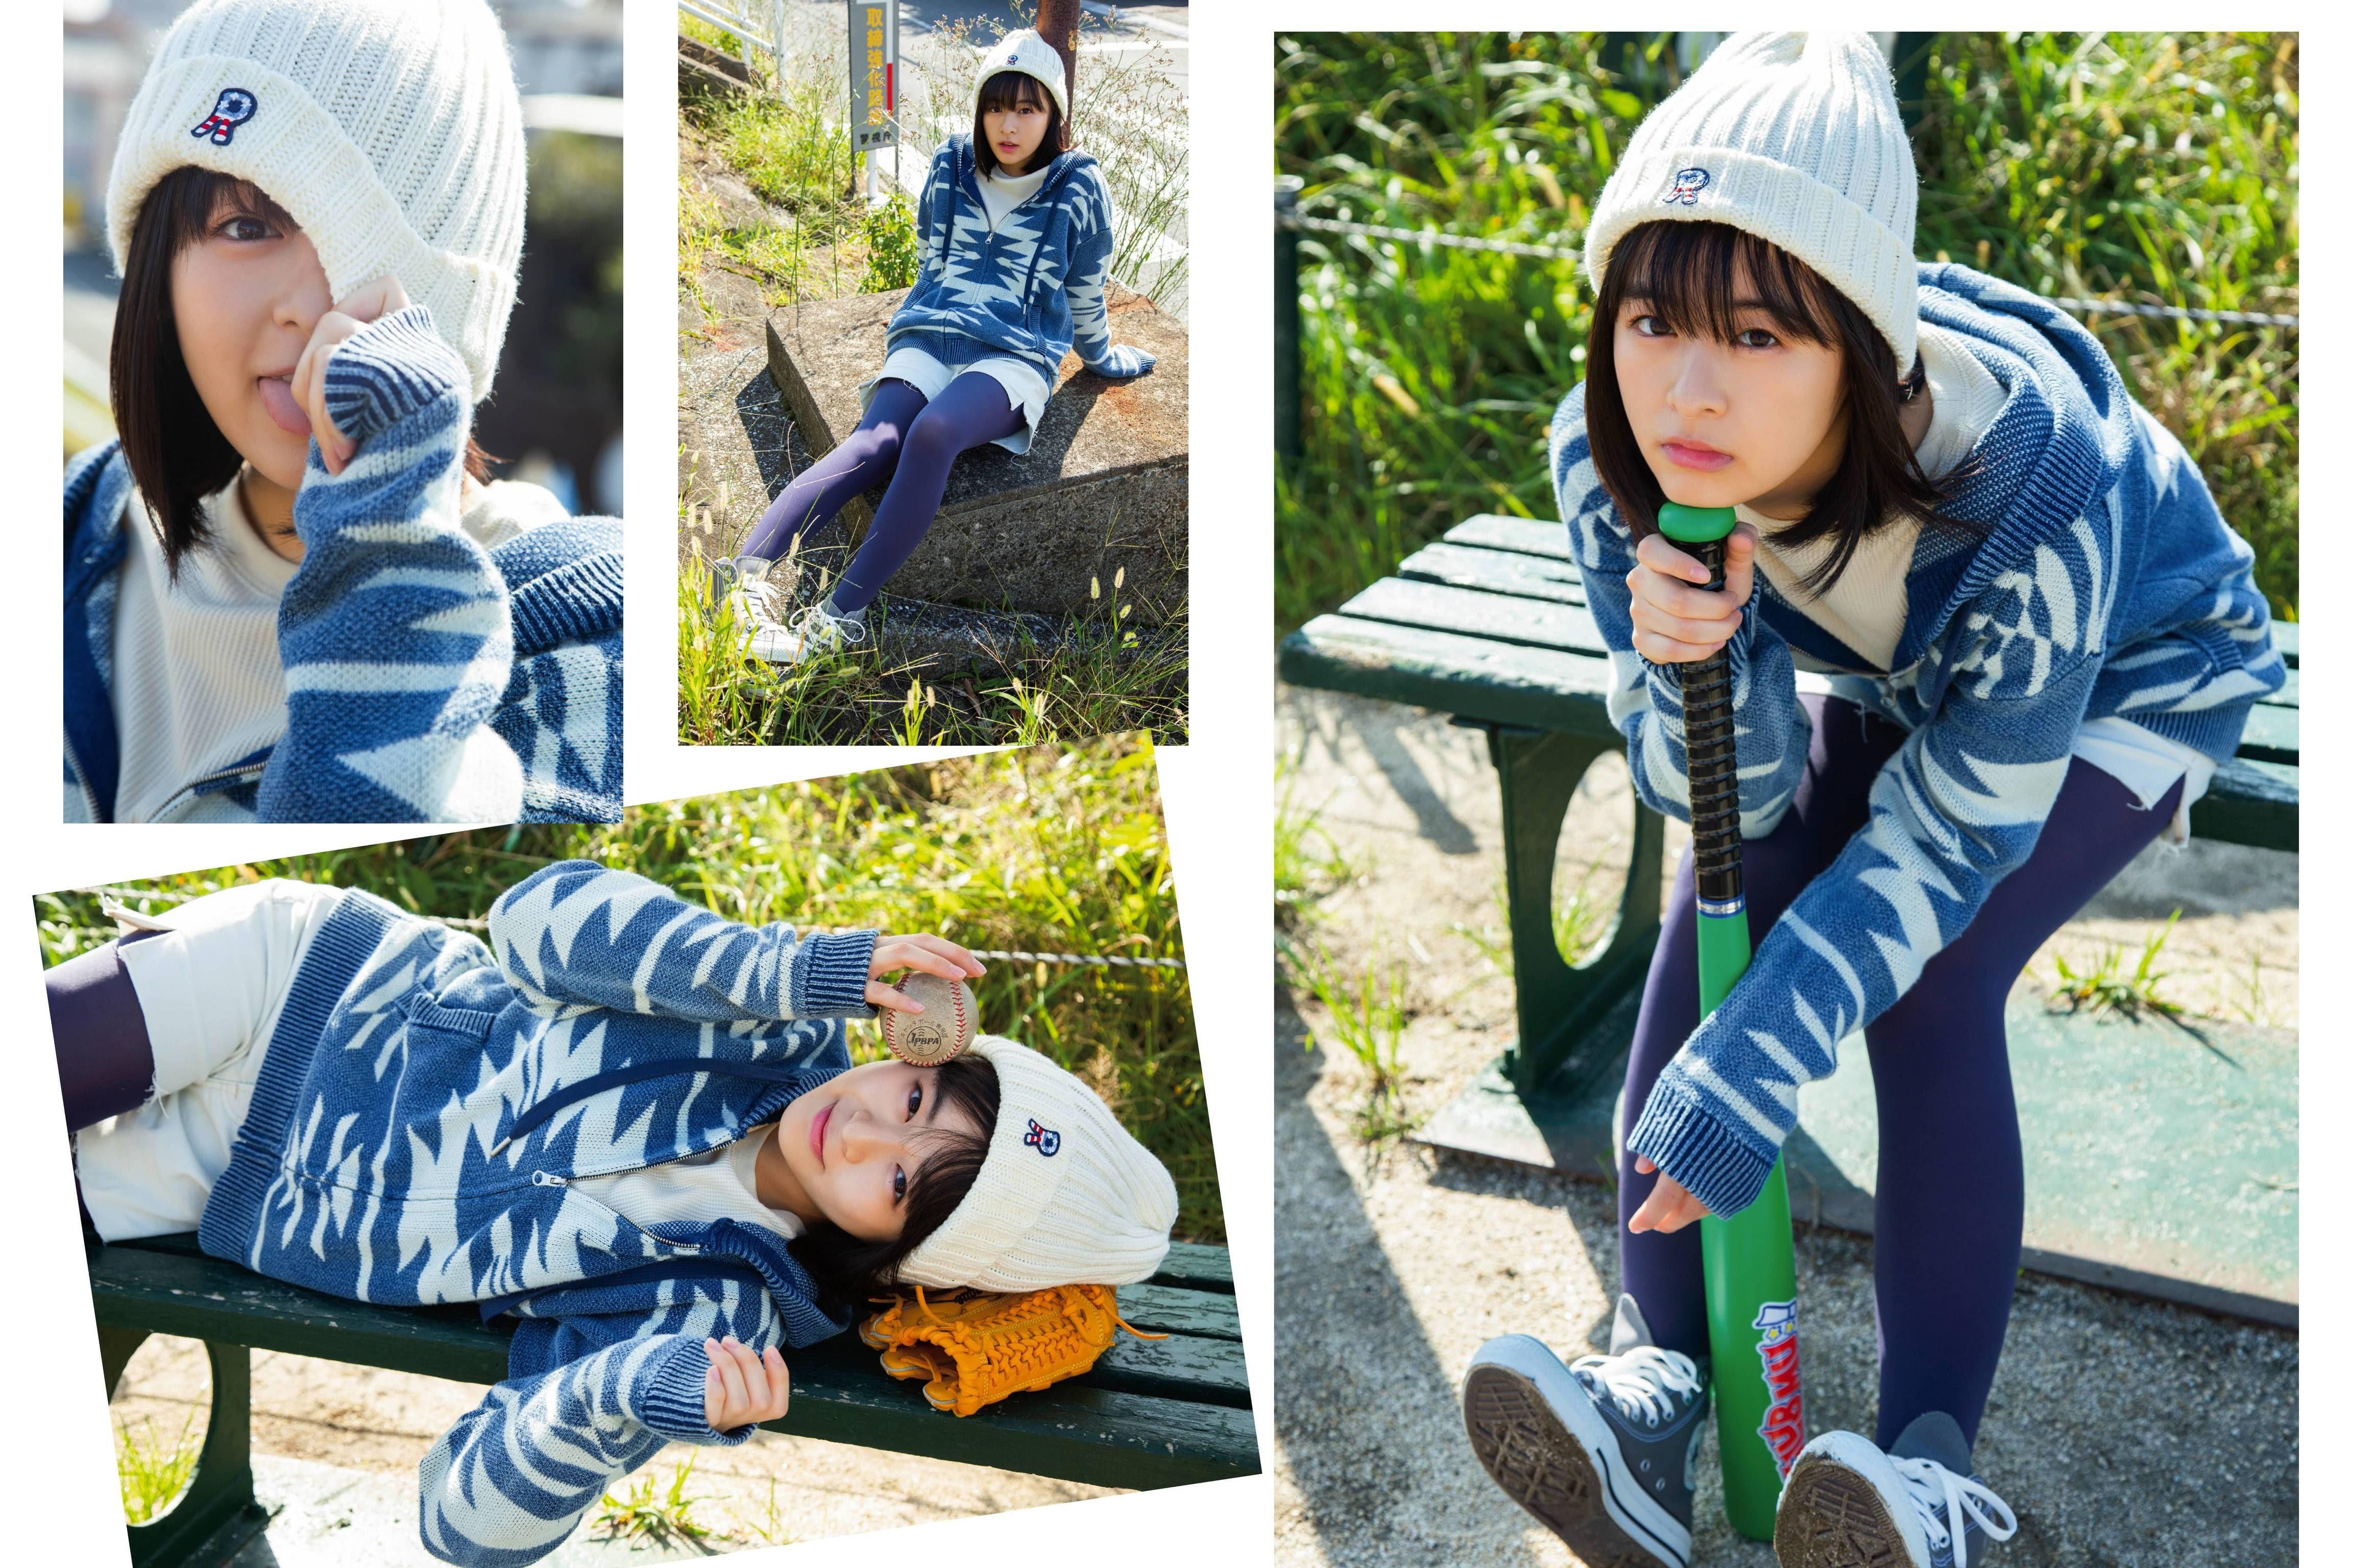 13-Nana Mori (4)